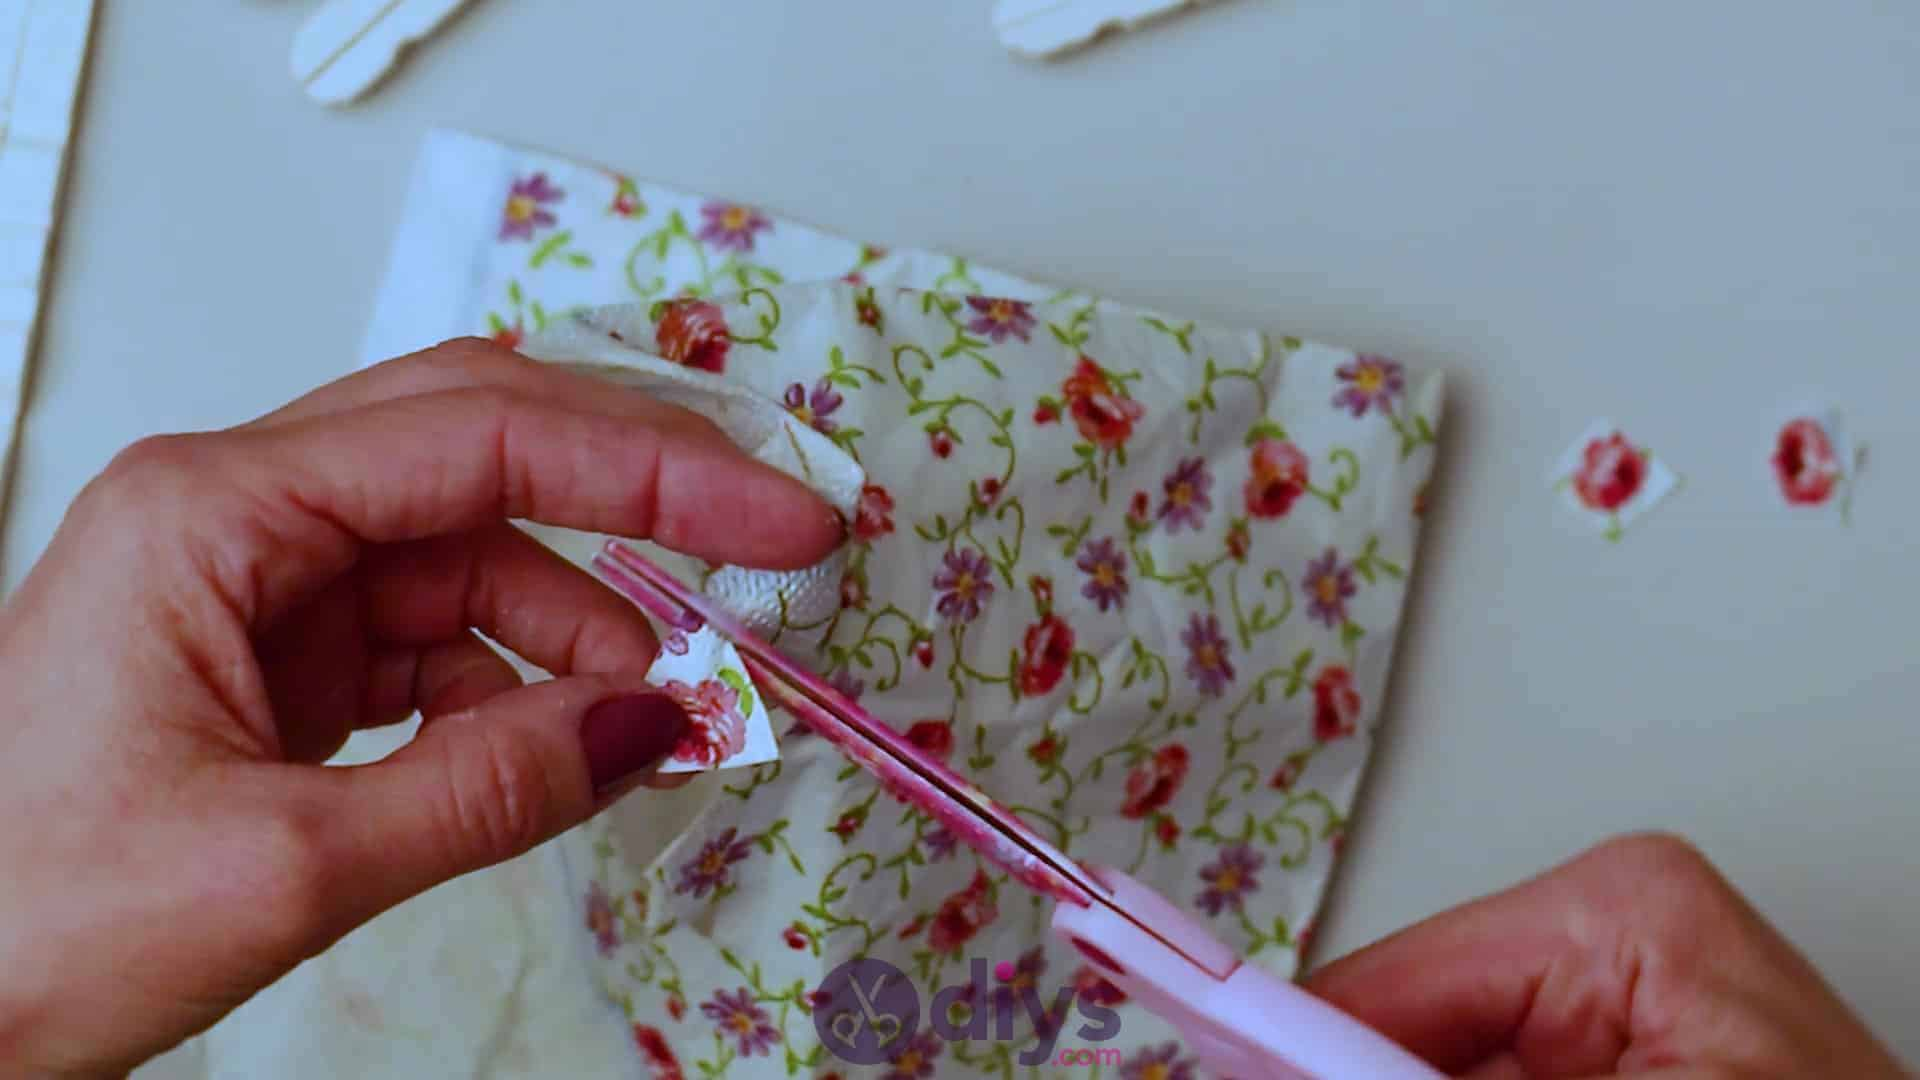 Diy clothespin napkin holder step 9a